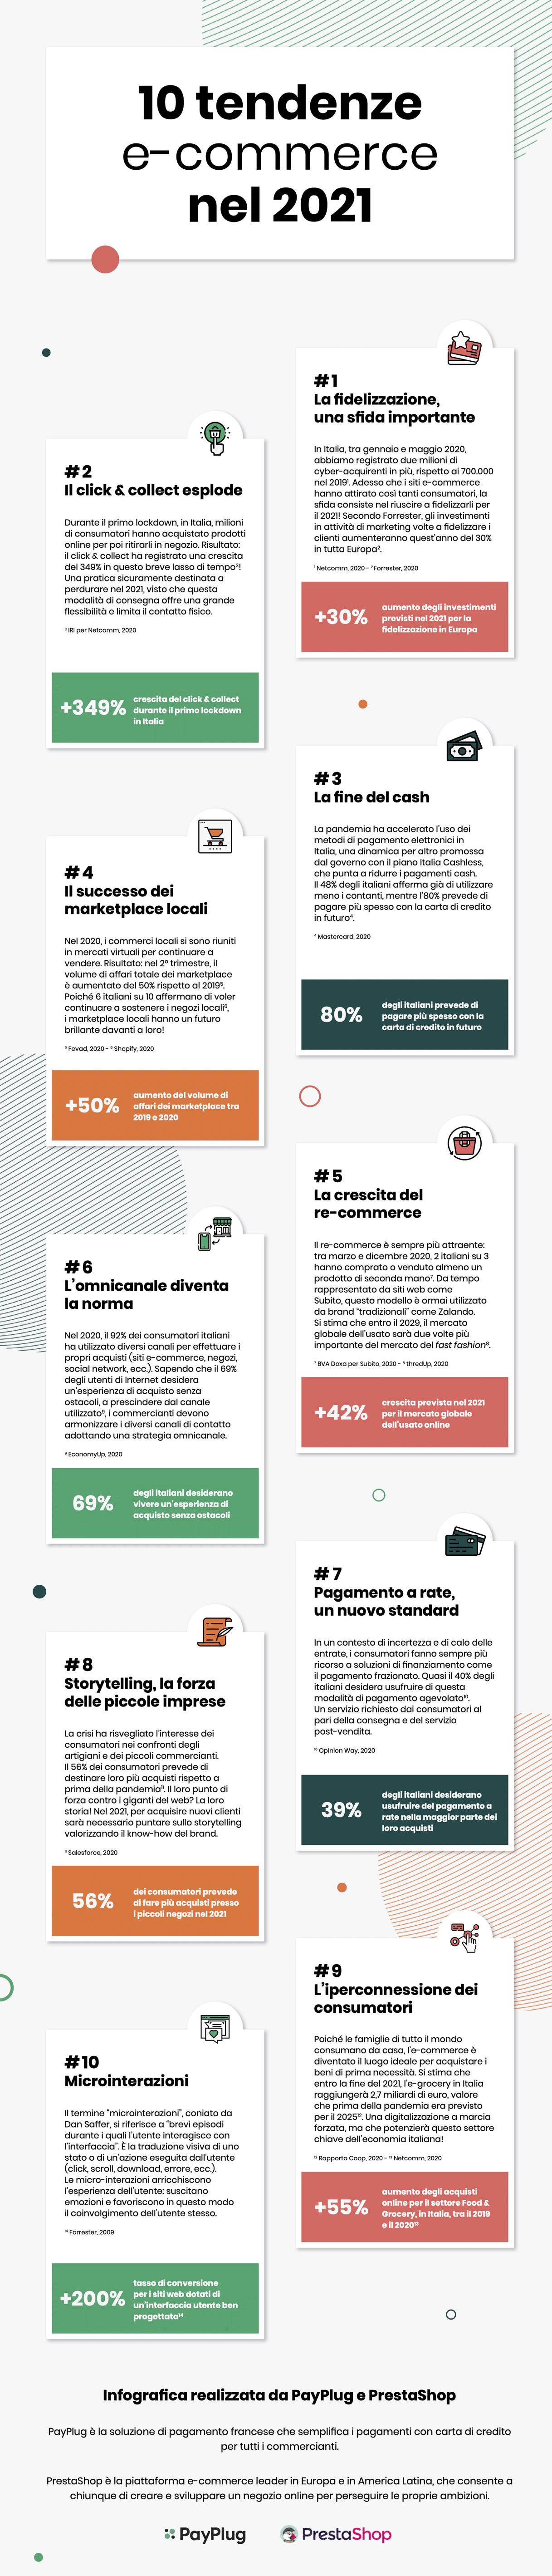 infografica trend ecommerce payplug